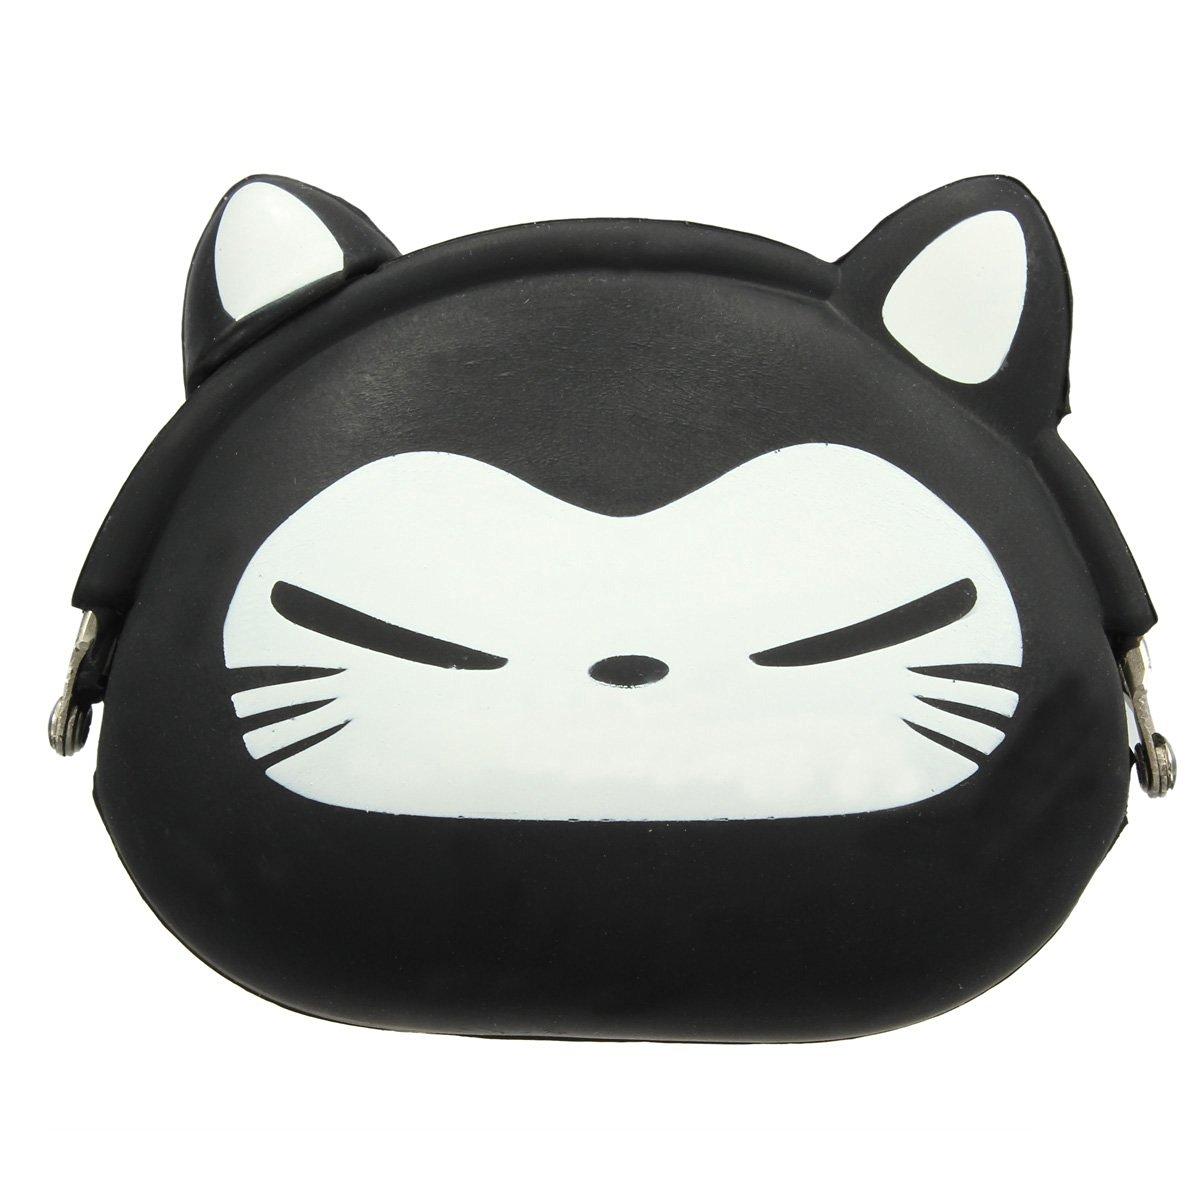 5x Women Girls Wallet Kawaii Cute Cartoon Animal Silicone Jelly Coin Bag Purse Kids Gift Black Fox